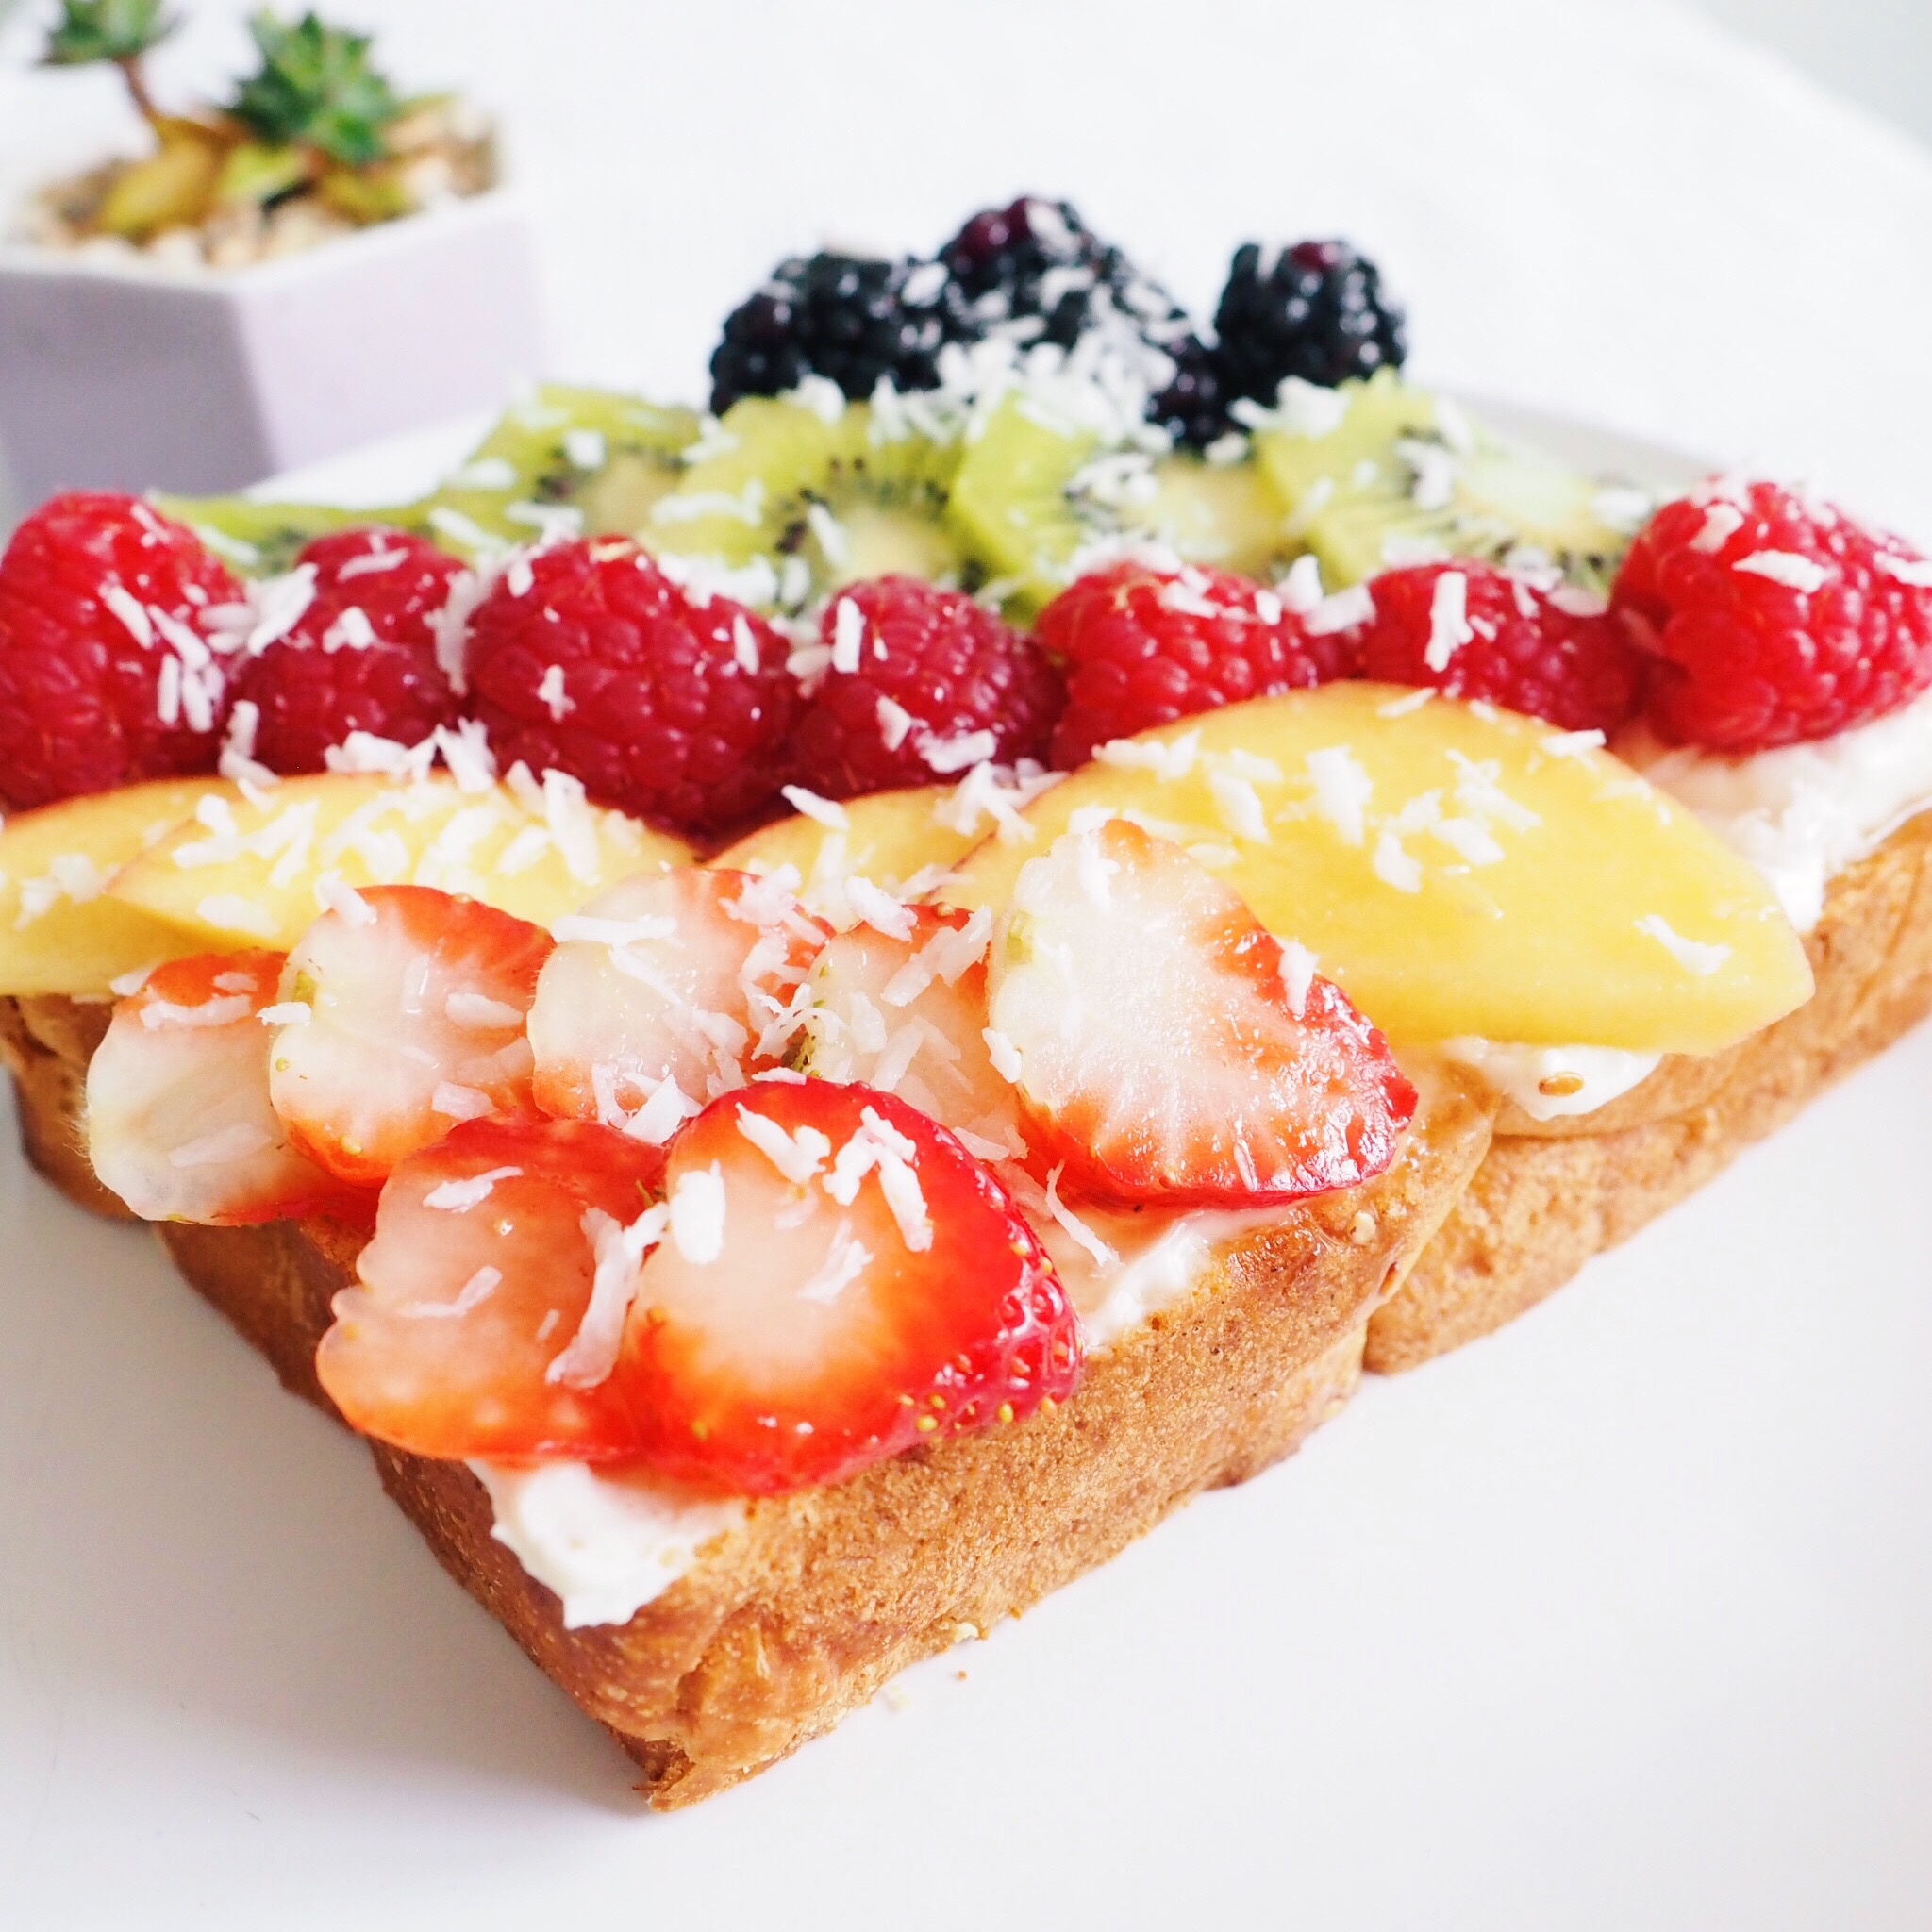 Vegan Mascarpone Fruit Toast